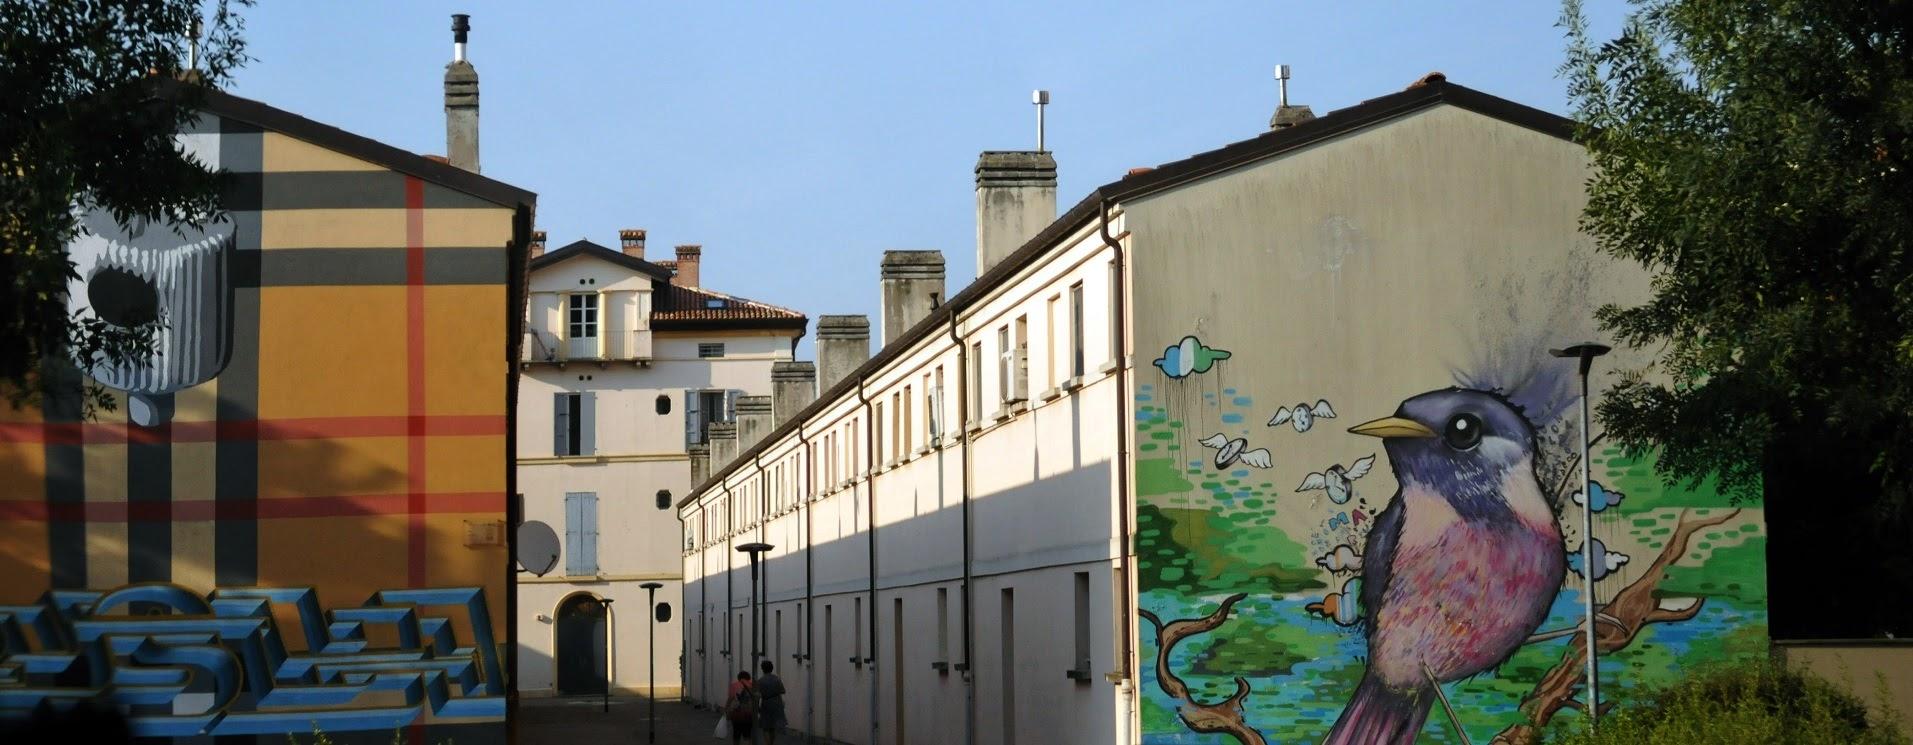 Foto case popolari